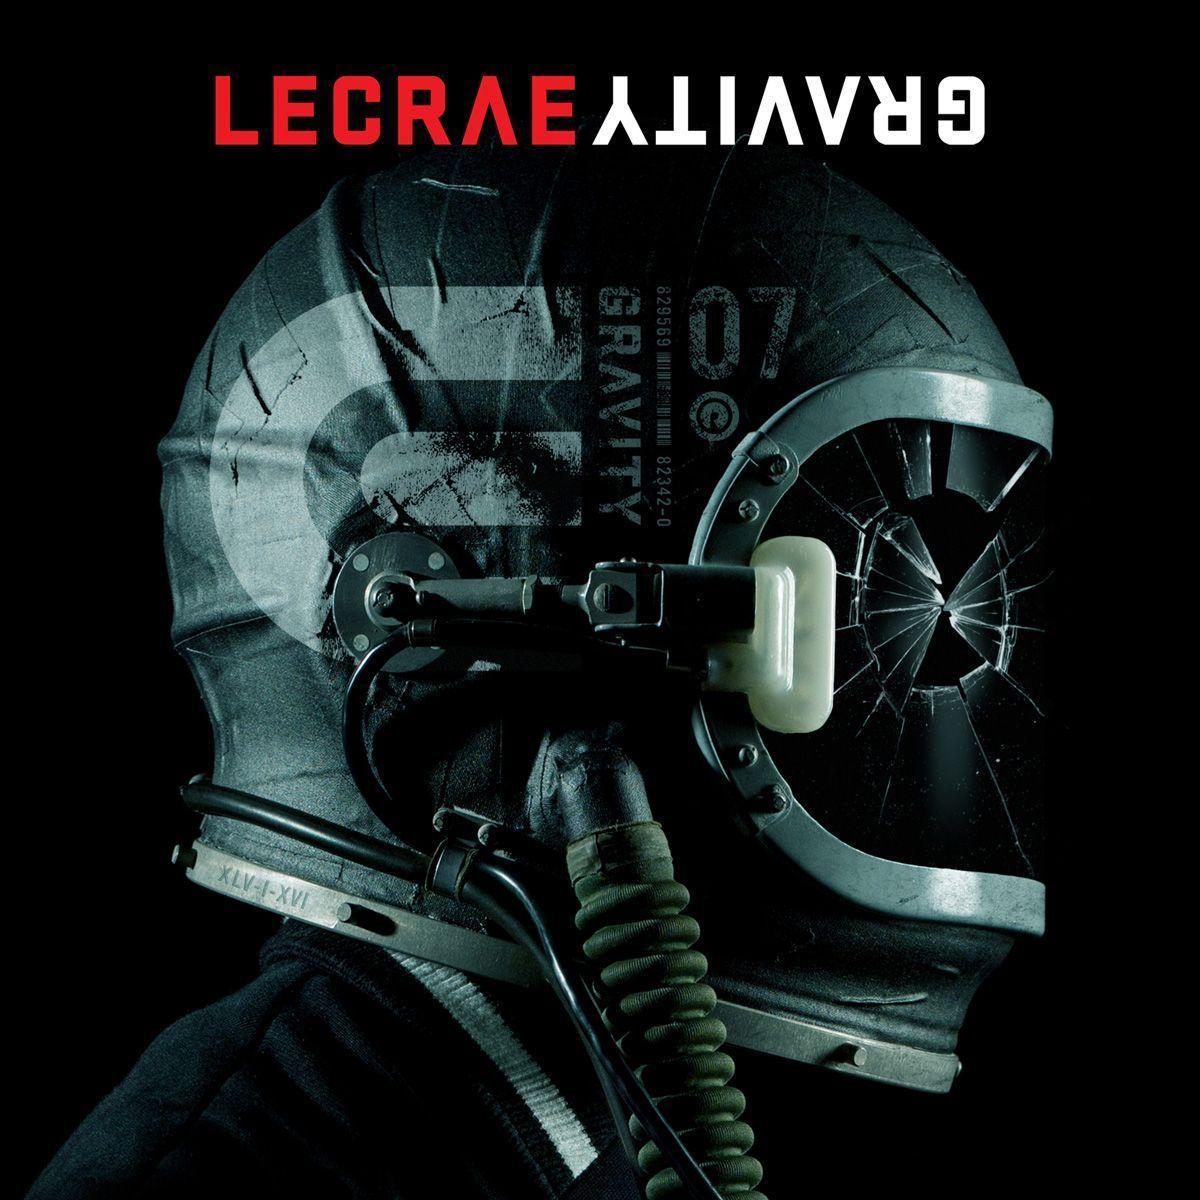 Lecrae Wallpapers 1200x1200